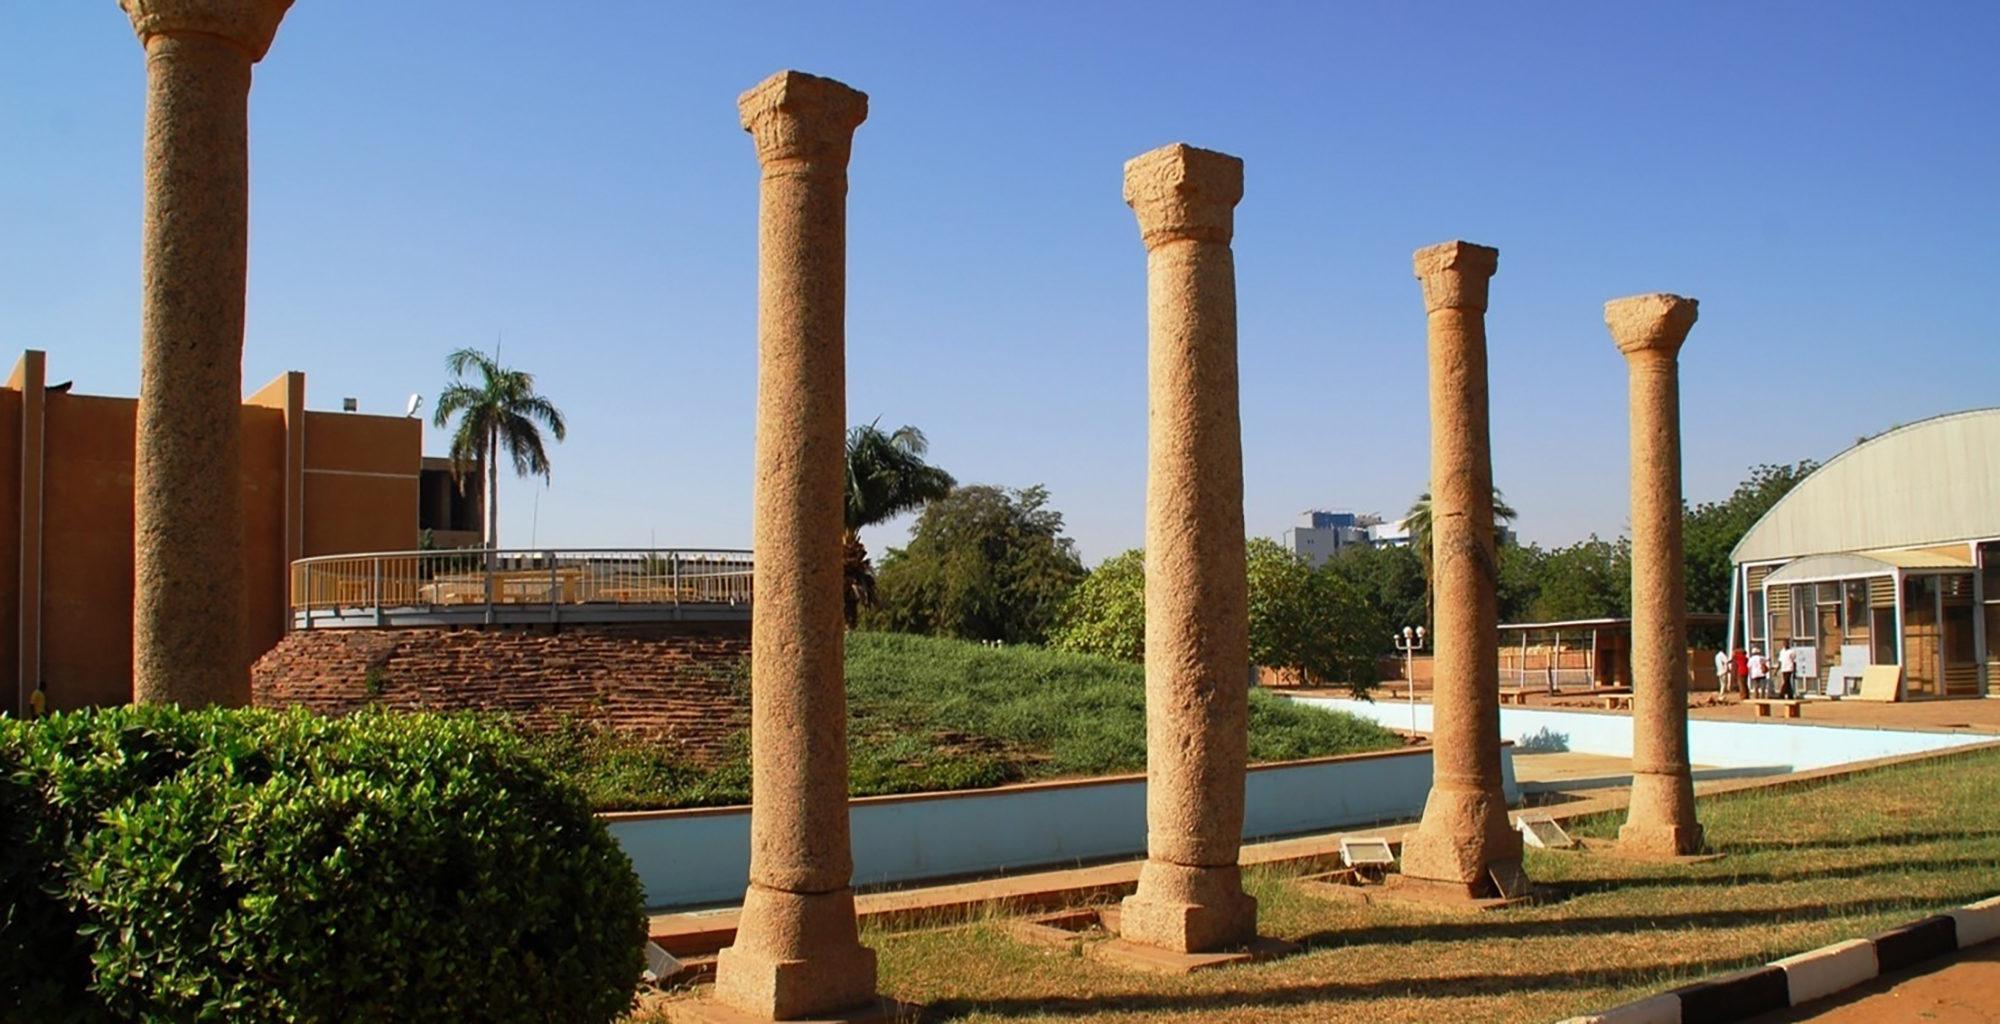 Sudan-Khartoum-Architecture